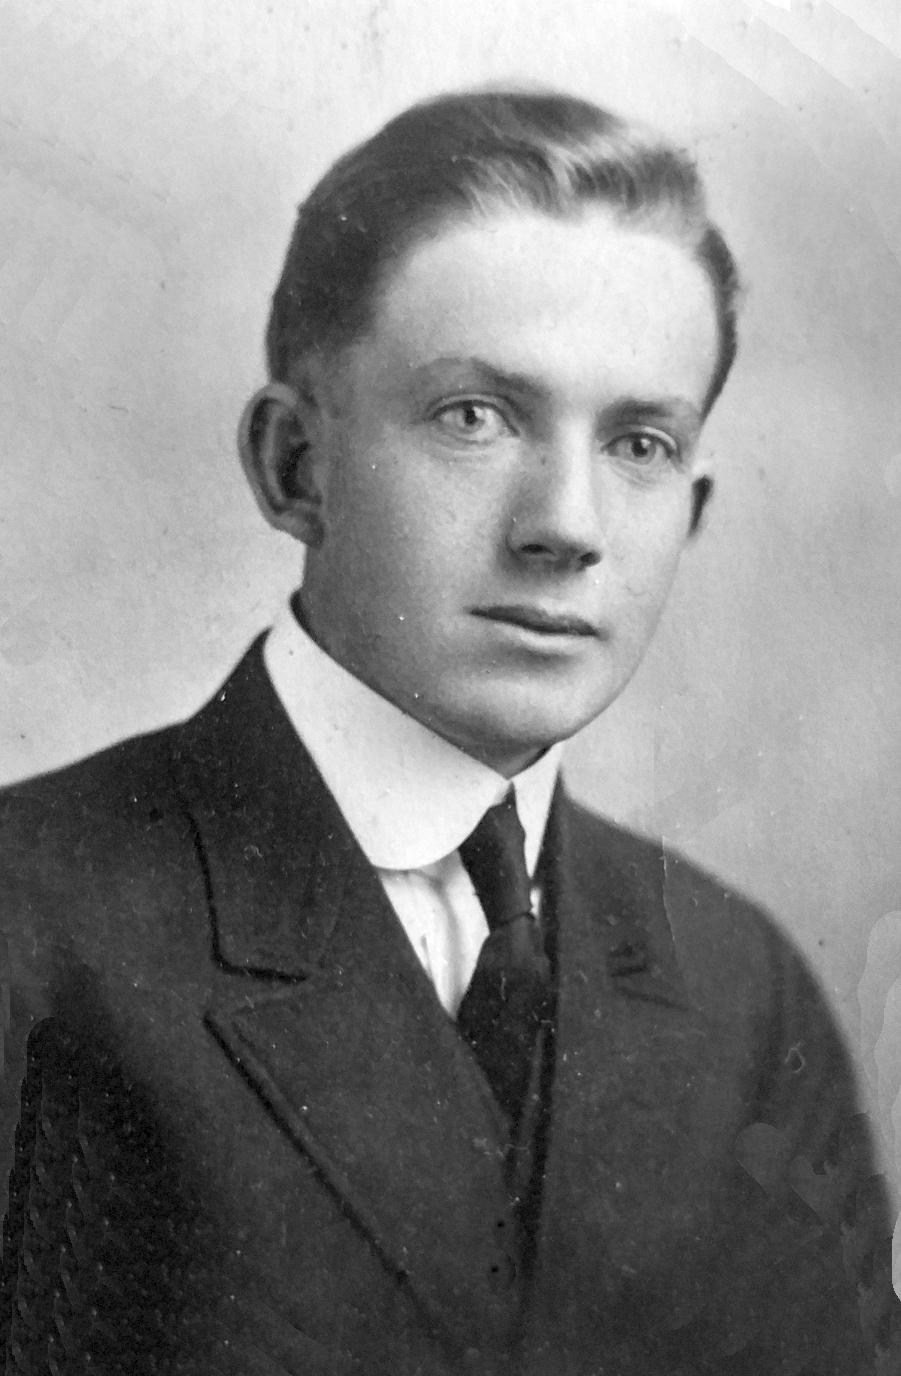 Andersen, Leroy Carson